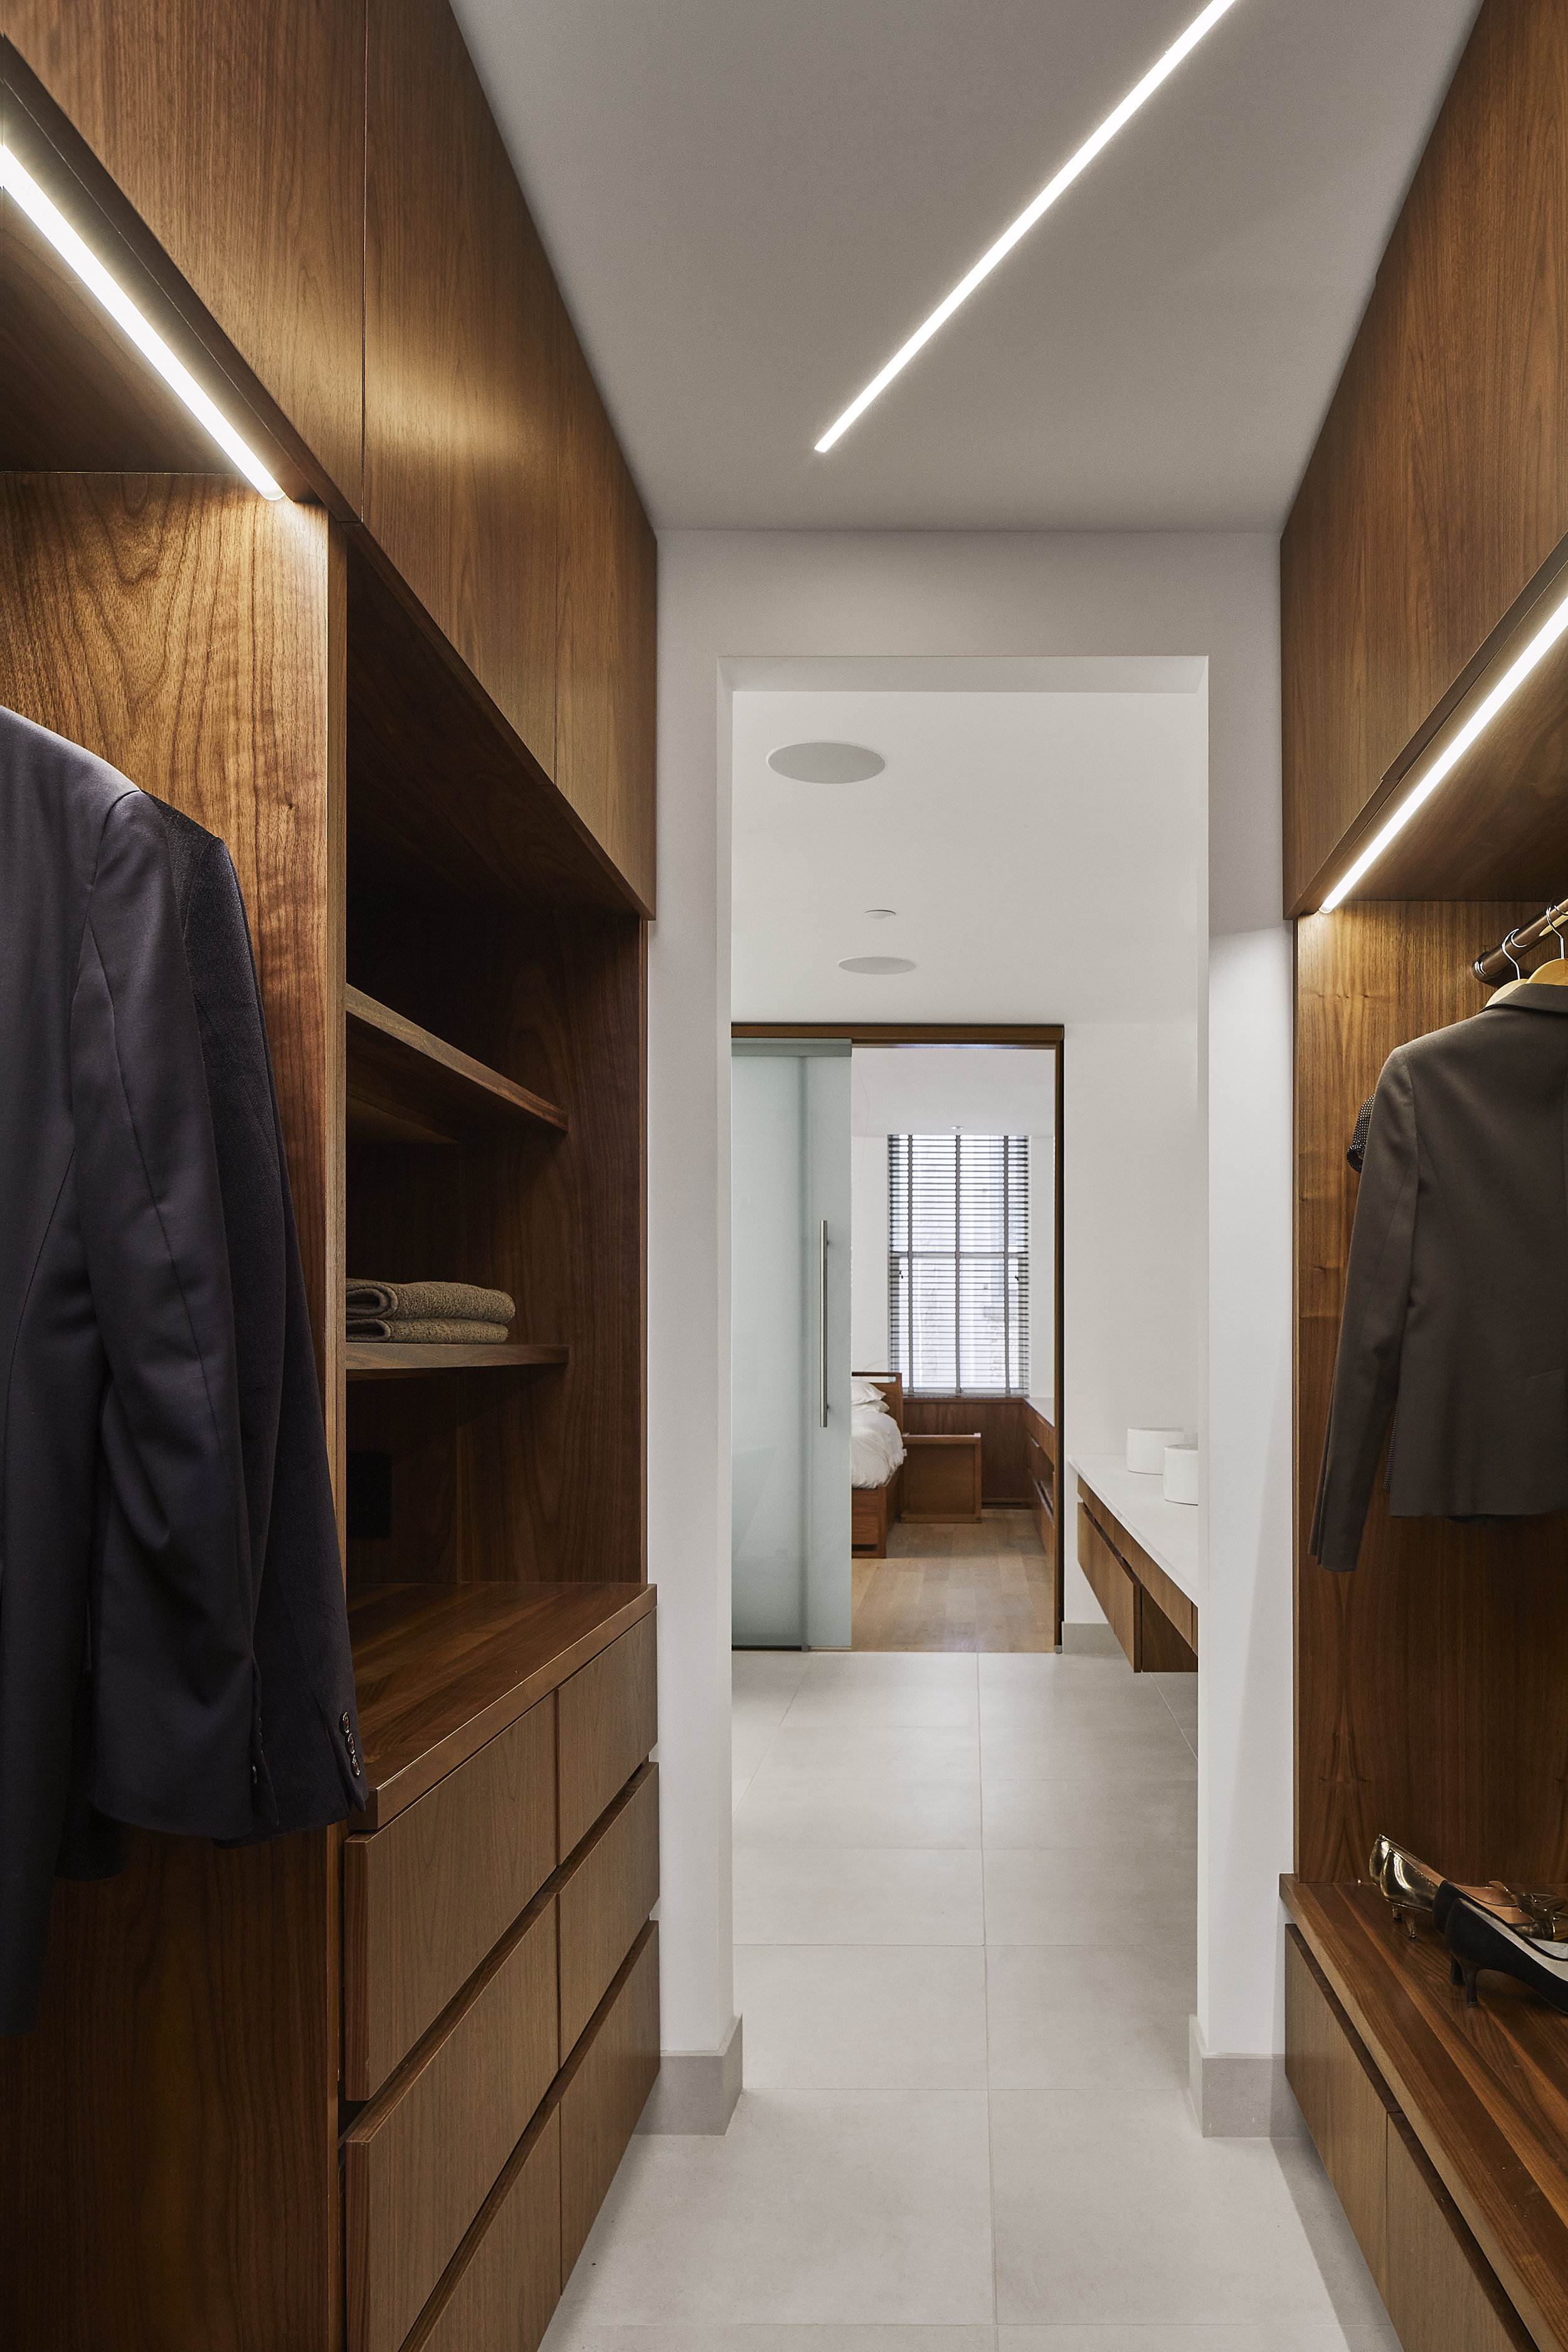 turkel_design_modern_prefab_home_soho_loft_closet_storage_cabinetry.jpg